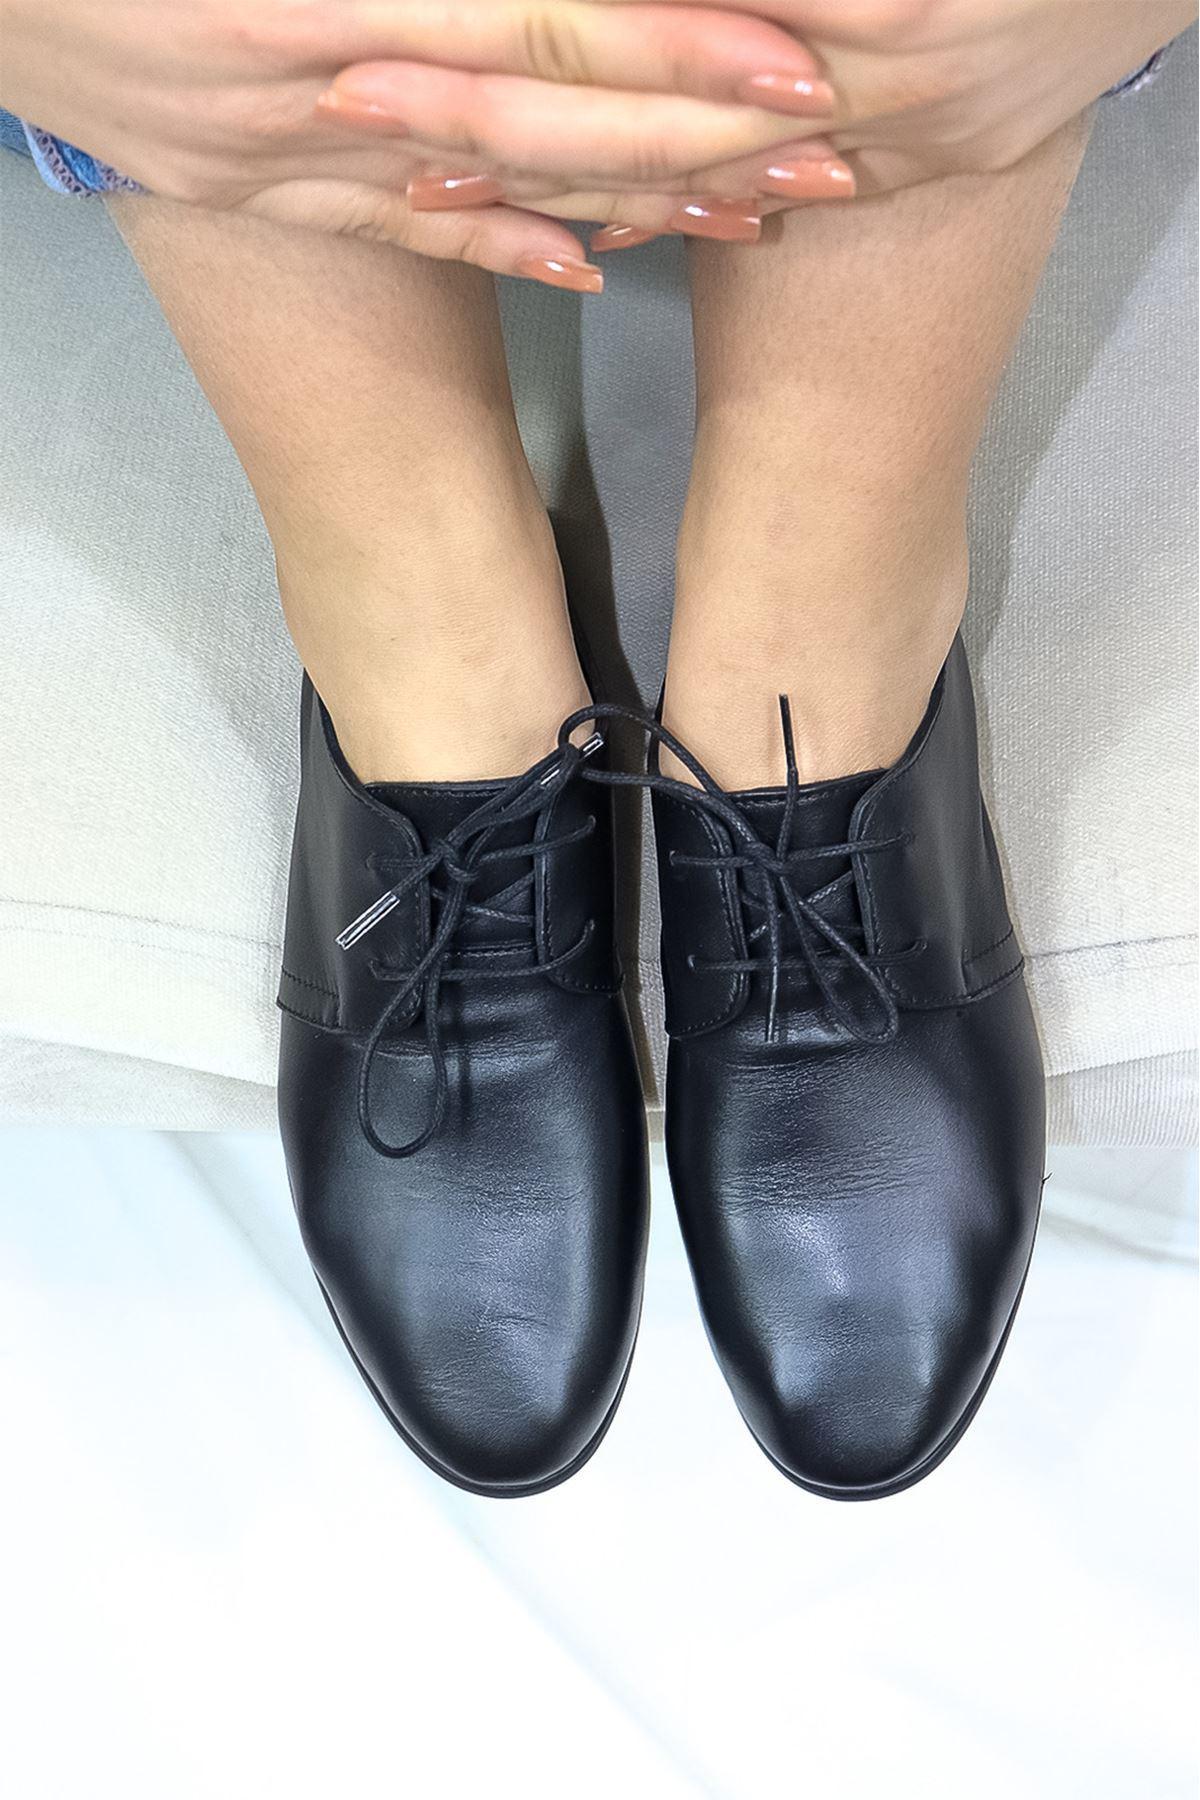 Mammamia - D21YA - 965-B Siyah Casual Kadın Ayakkabısı